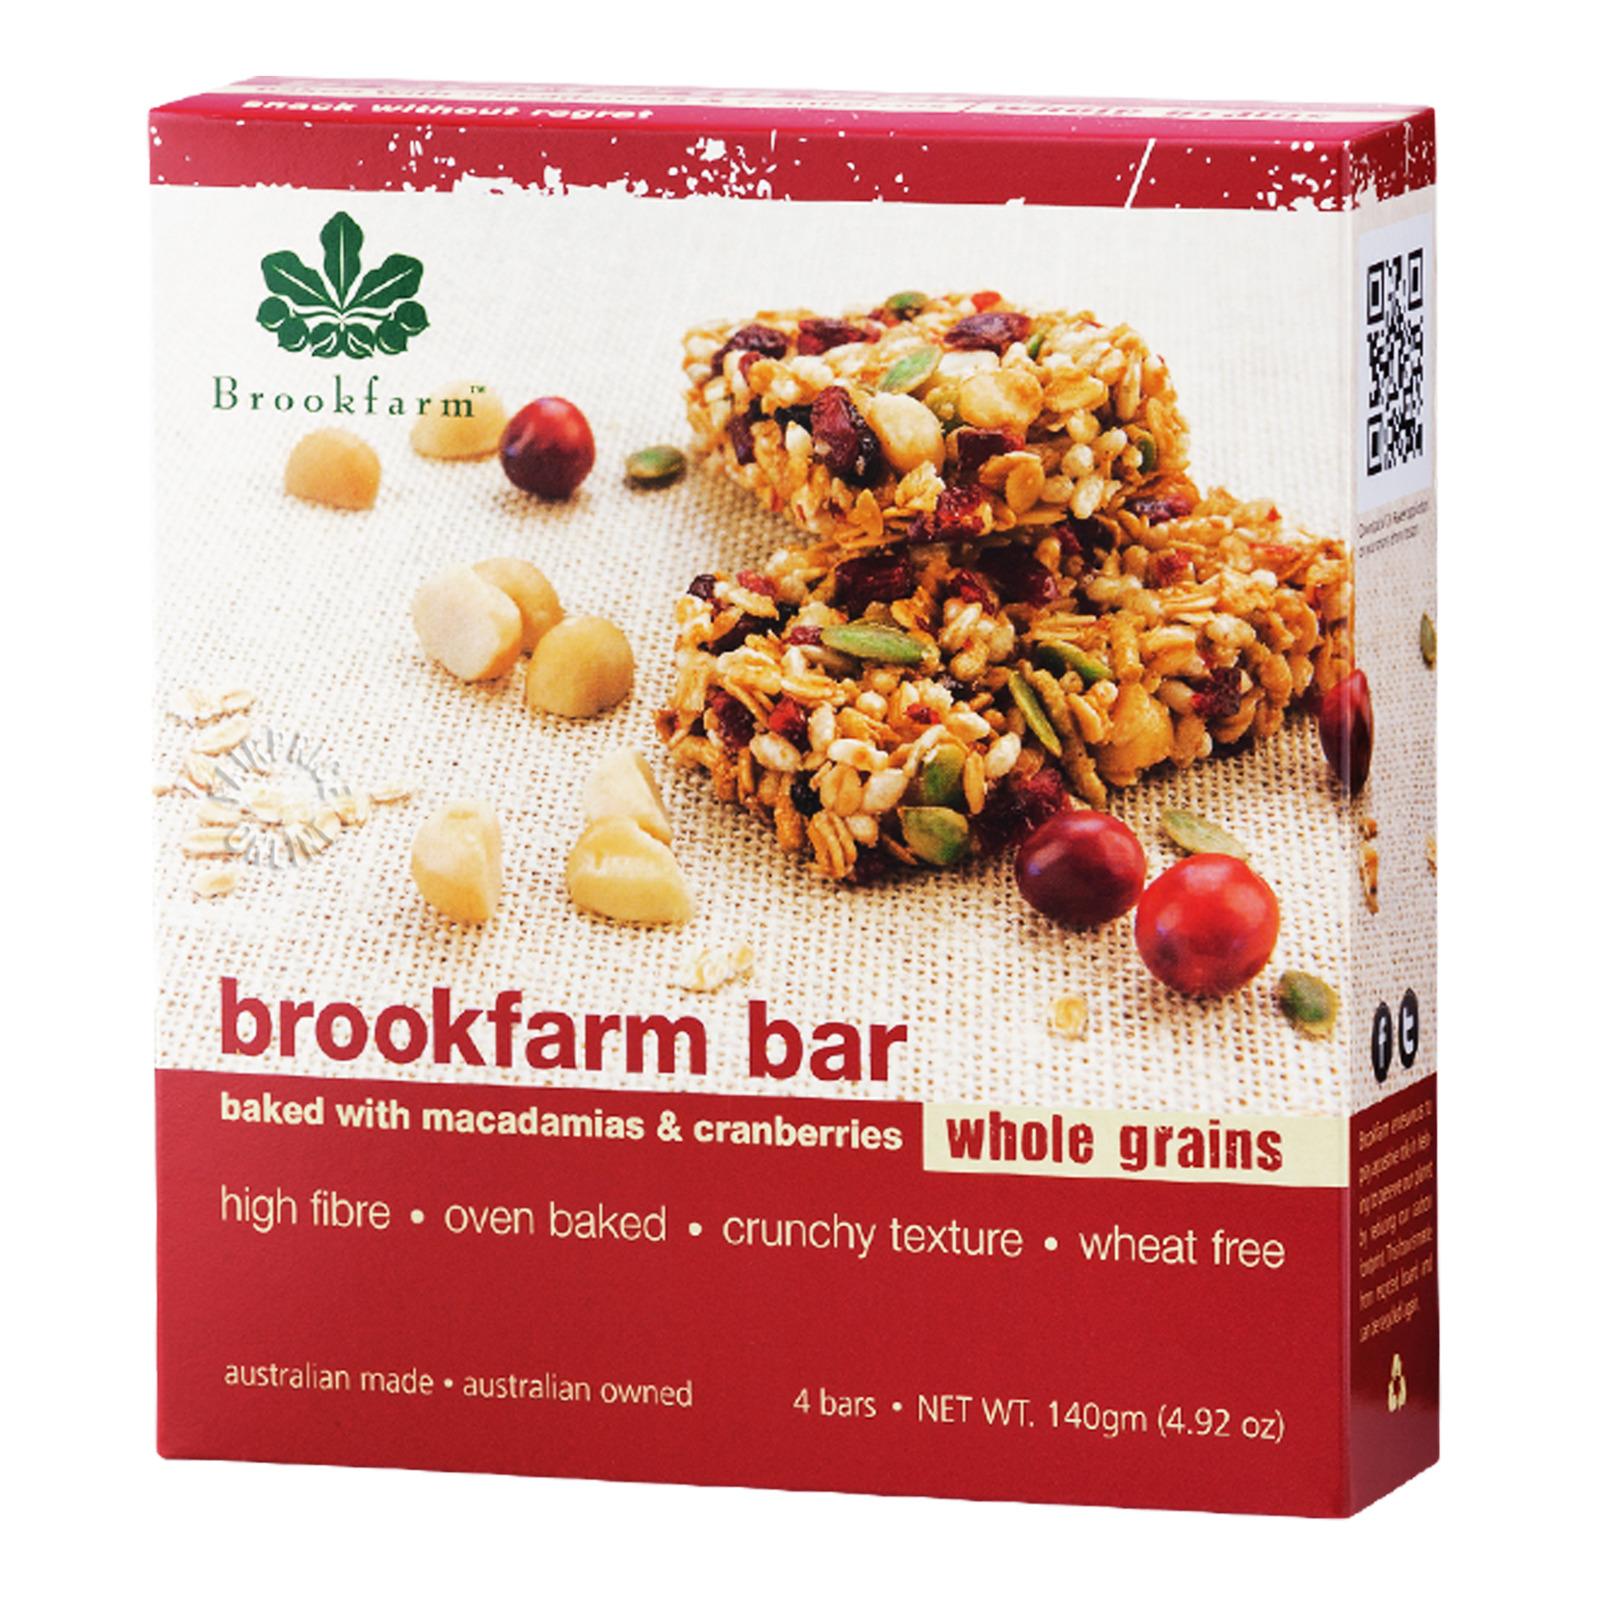 Brookfarm Wholegrain Cereal Bar - Macademia & Cranberries